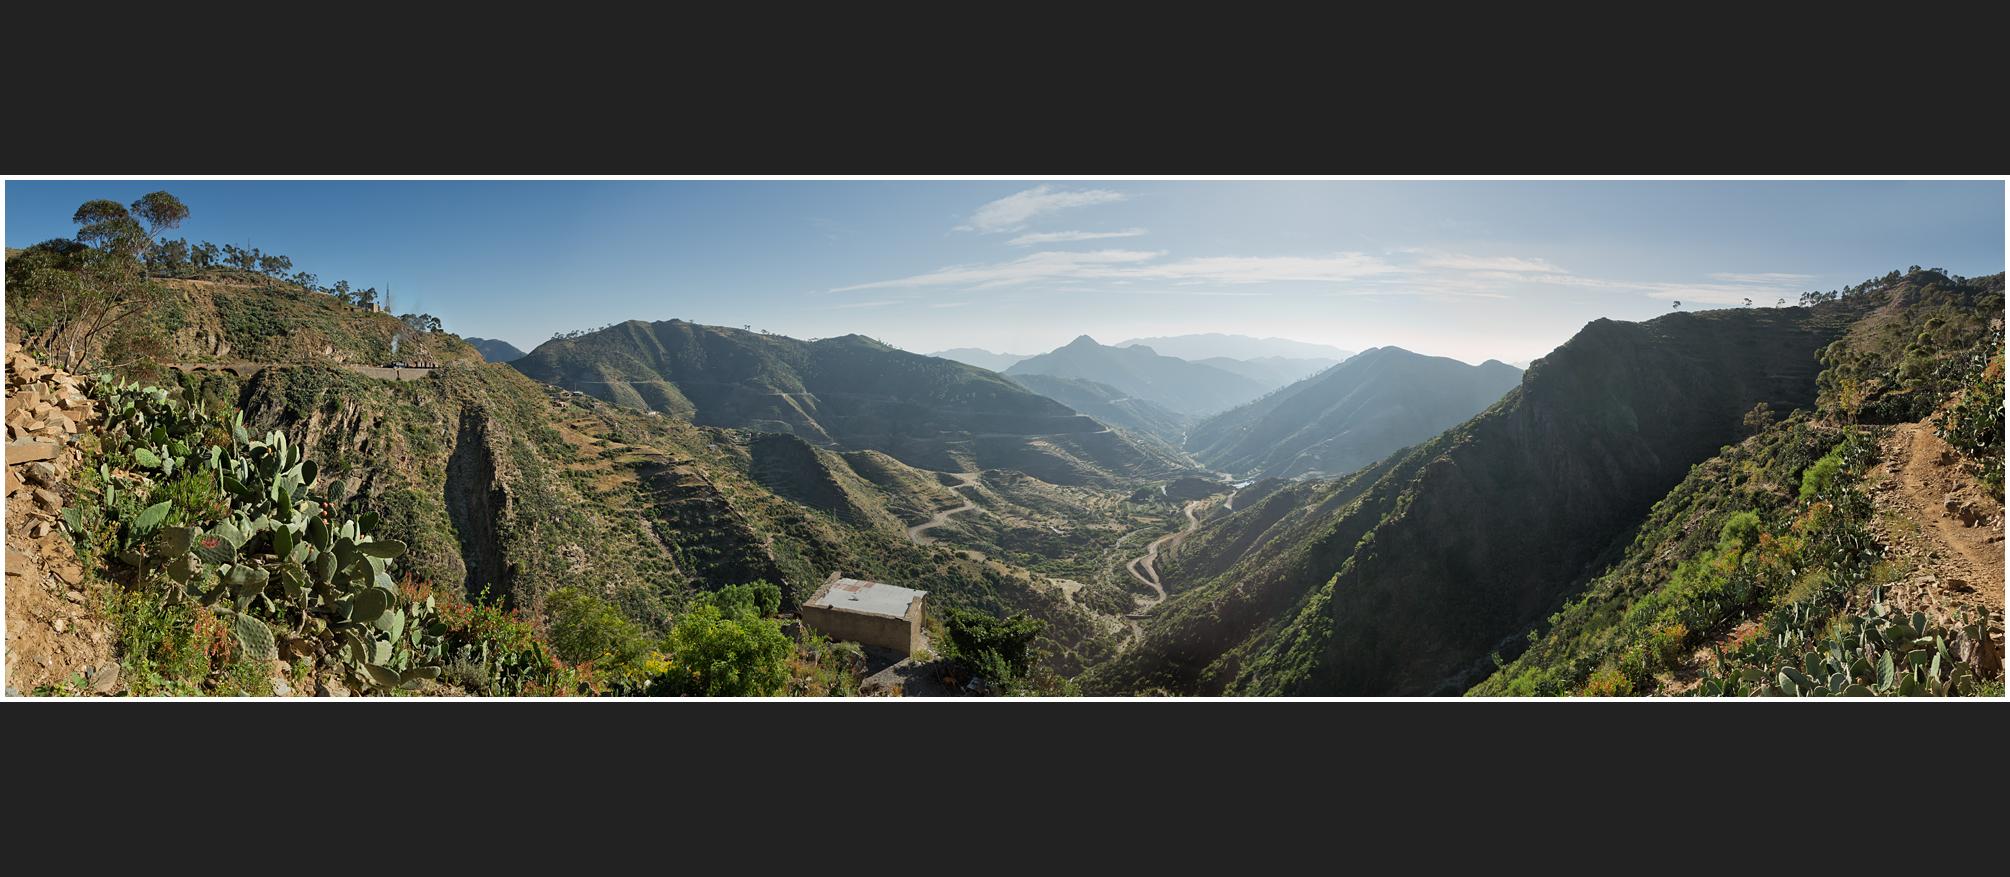 Bergmallets in Eritrea CXXVII